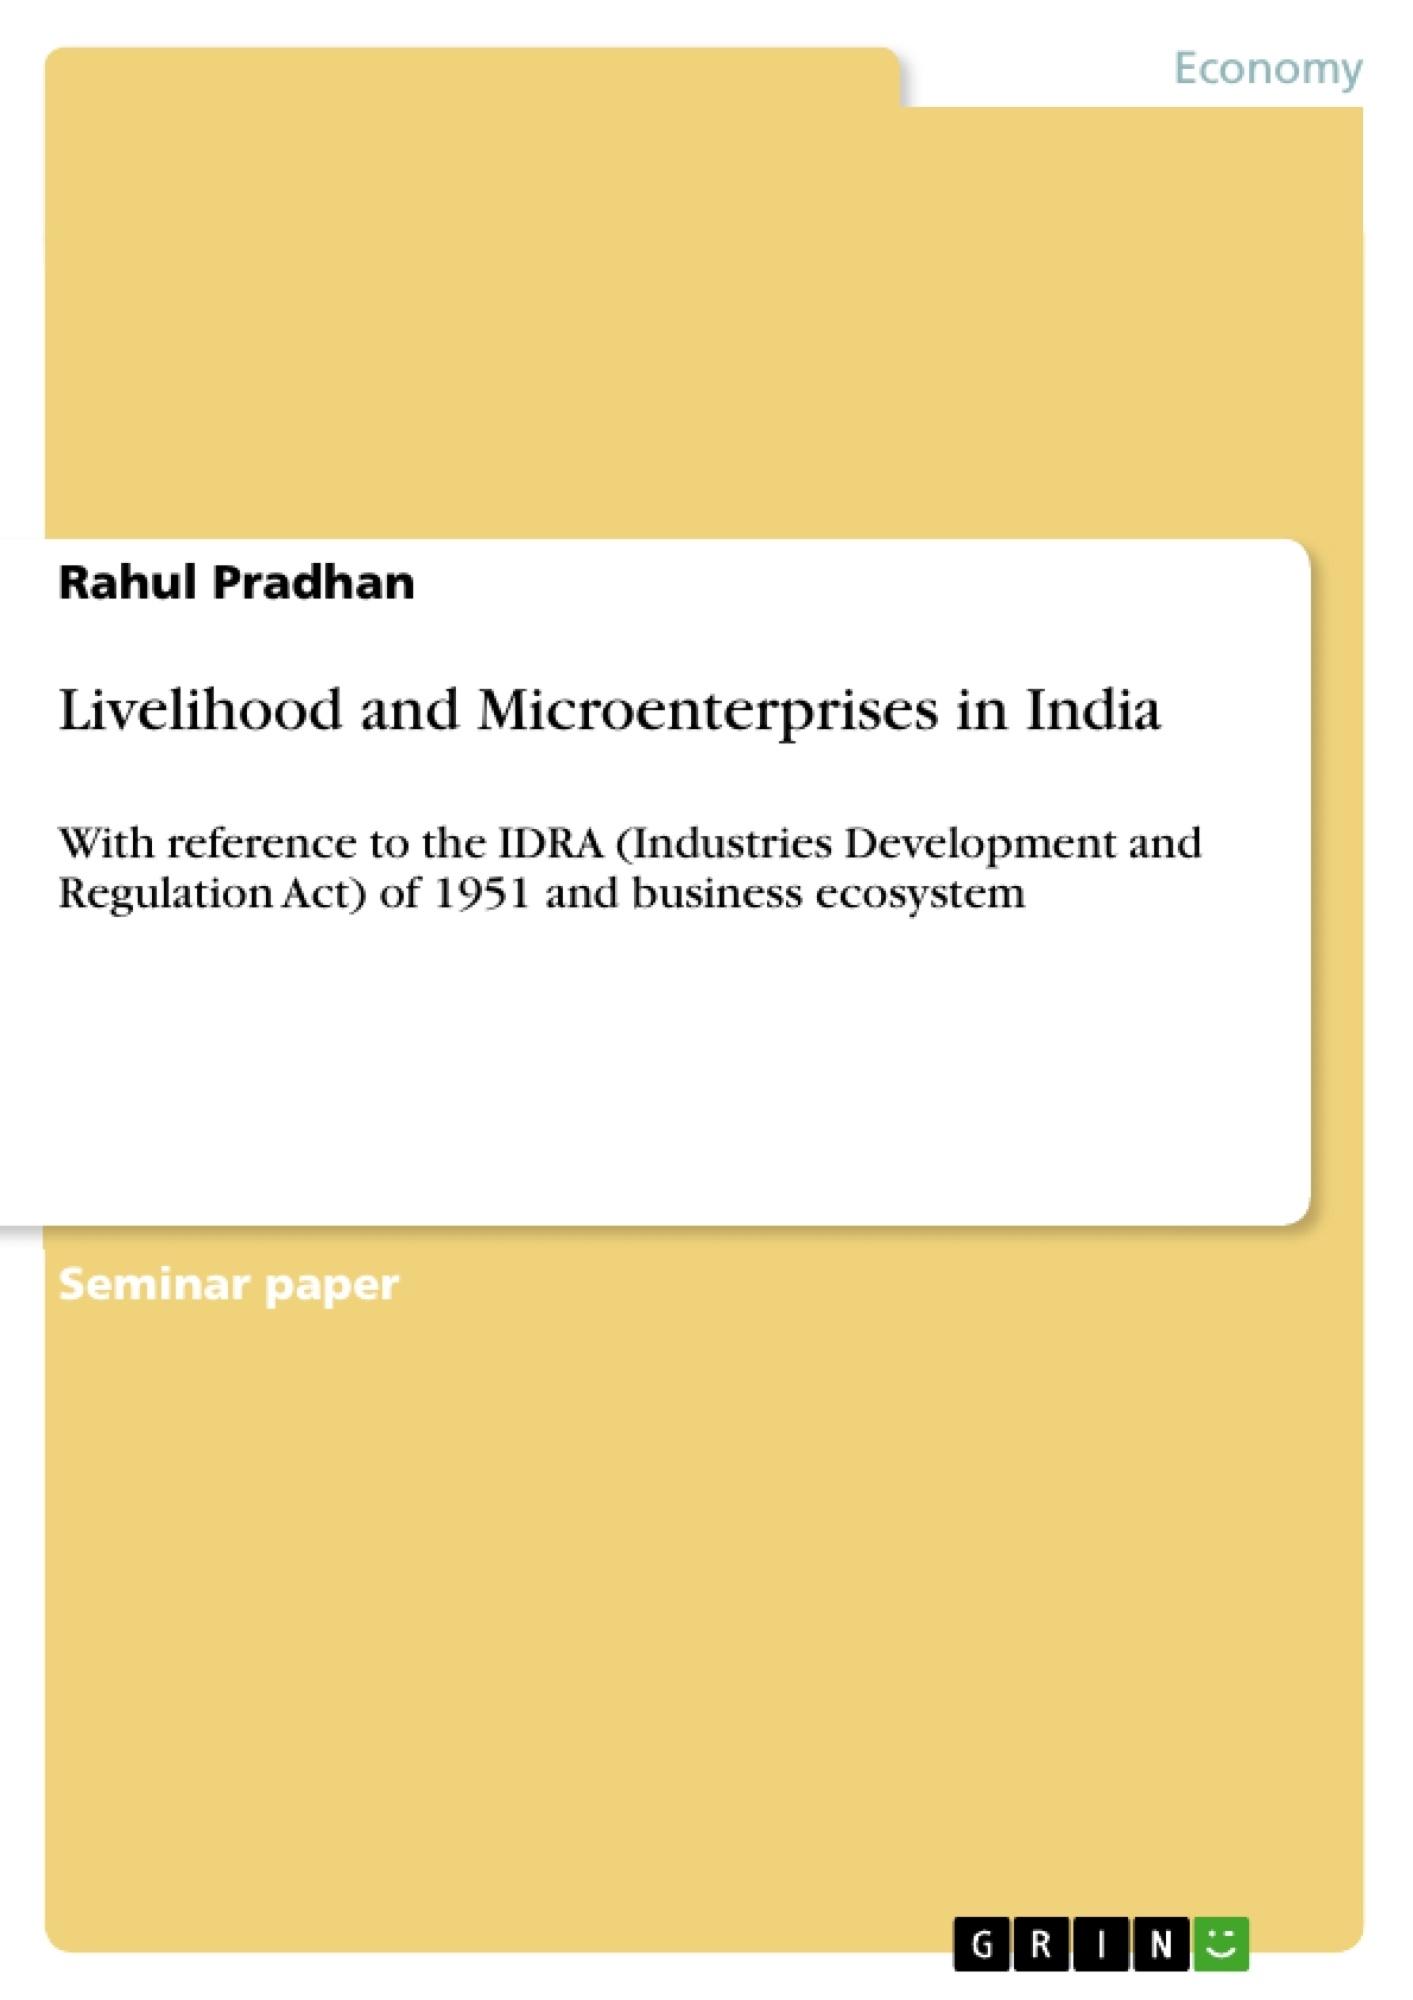 Title: Livelihood and Microenterprises in India